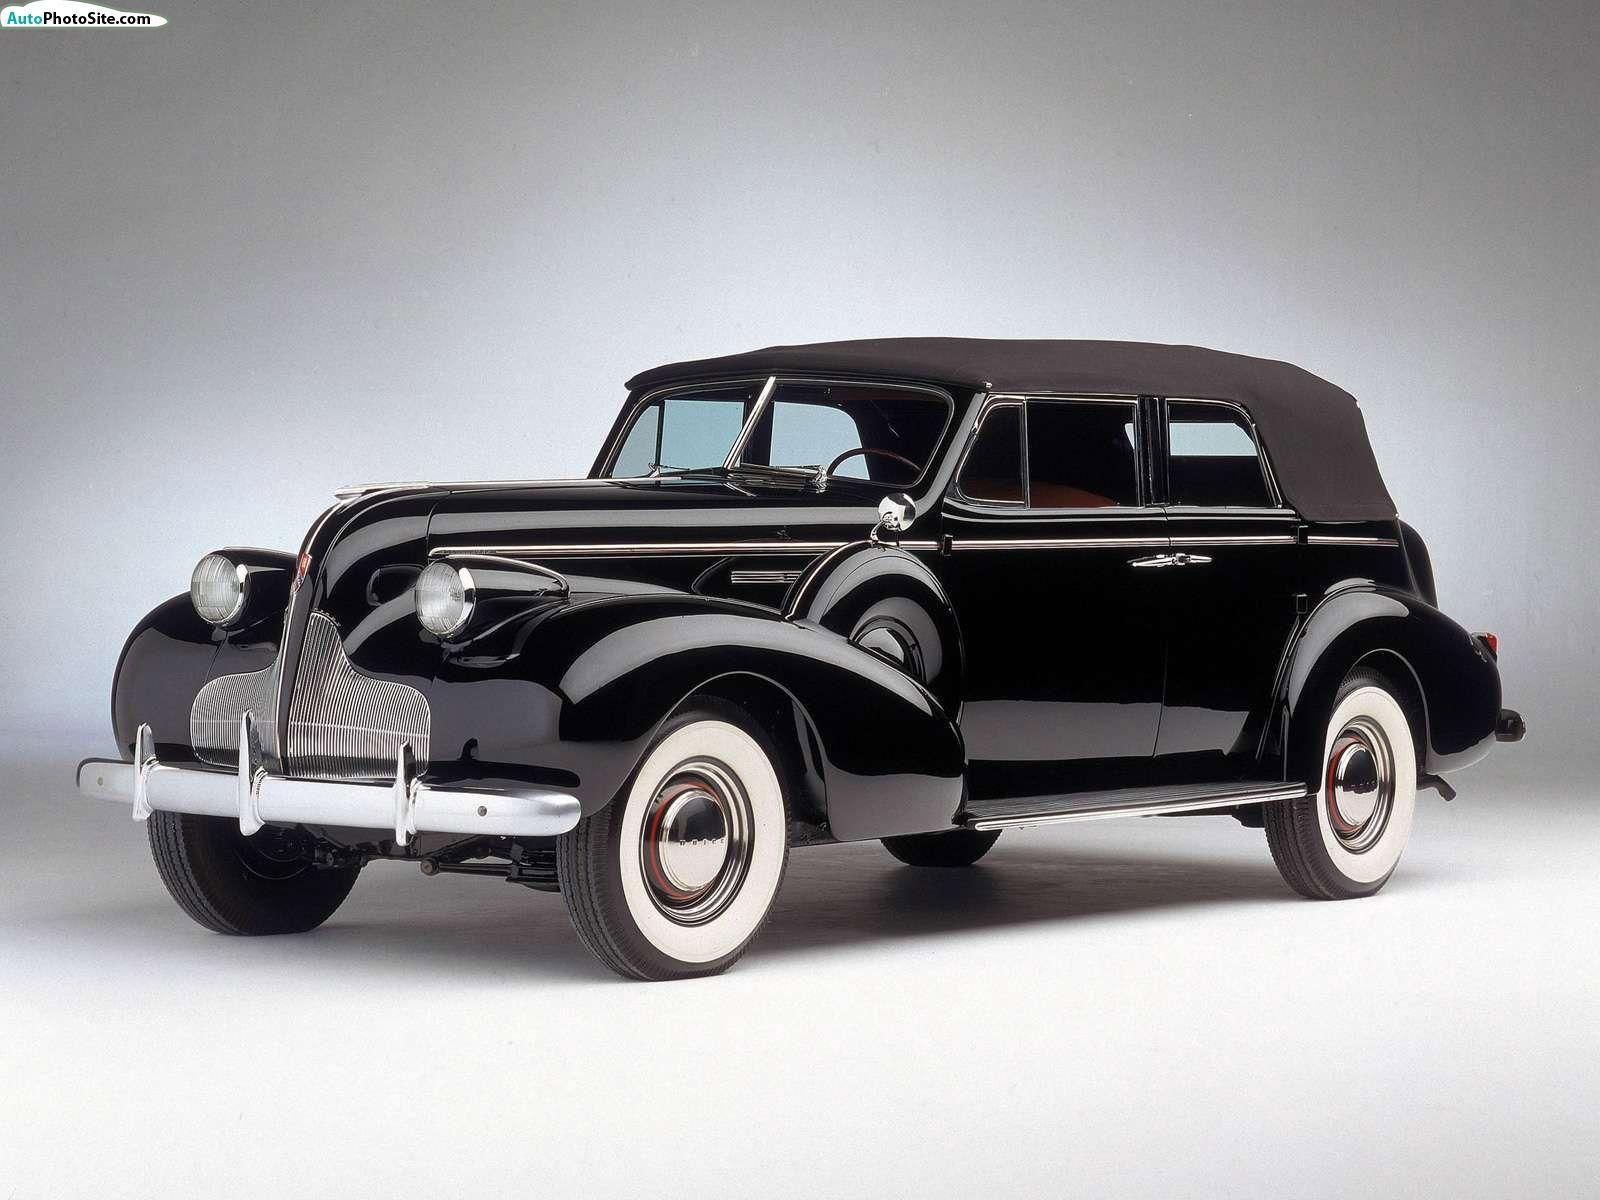 Buick Roadmaster 1939 01 Buick Roadmaster Classic Cars Buick